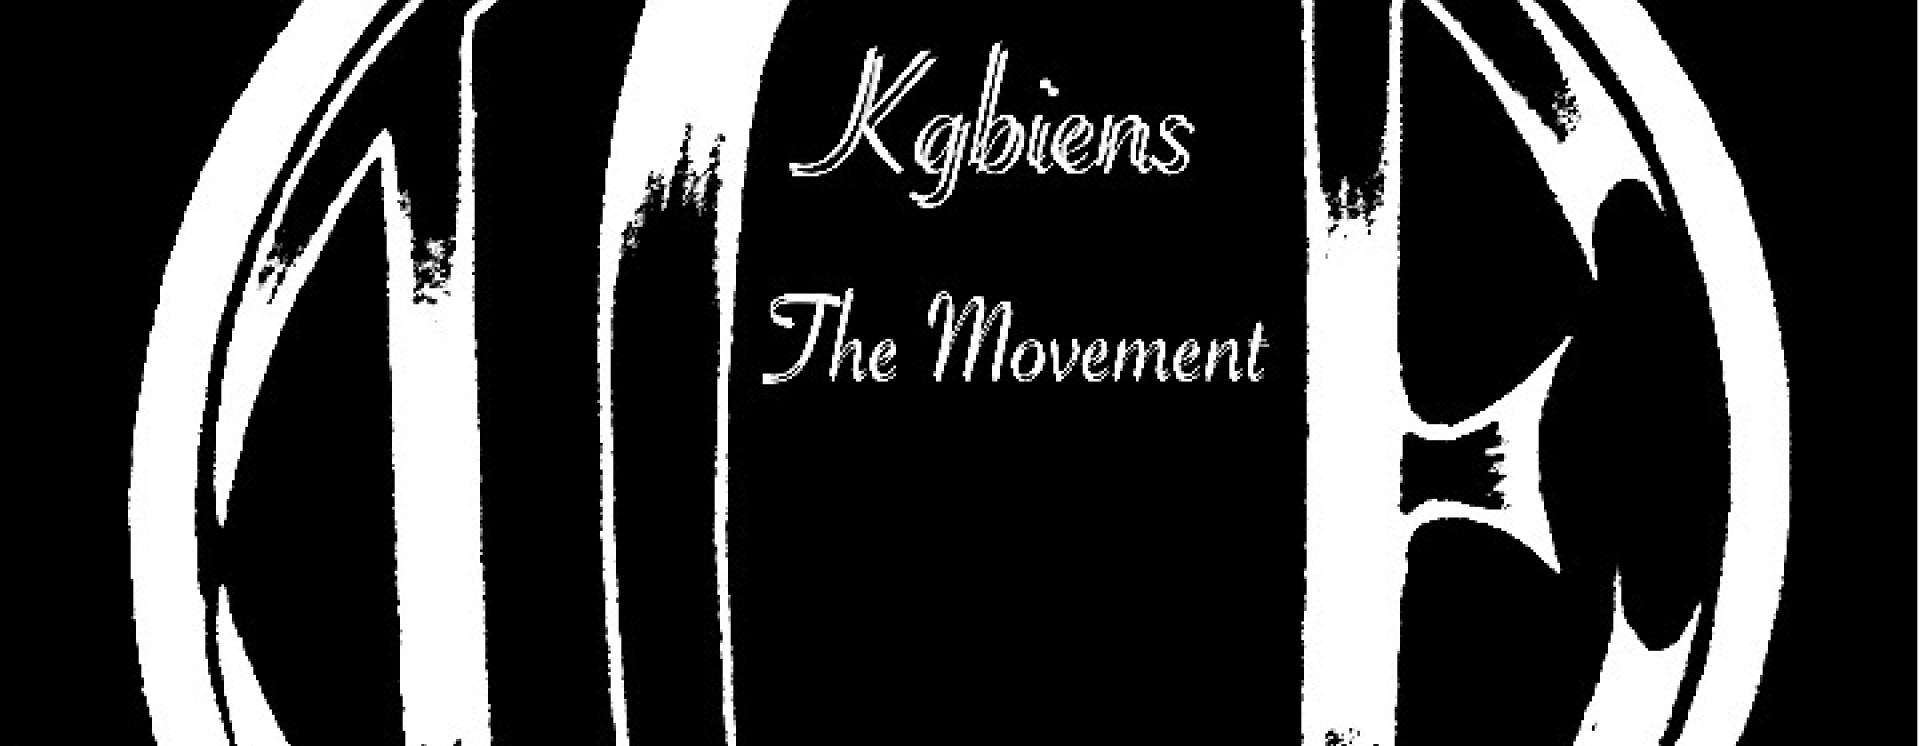 1425838666 the movement copy